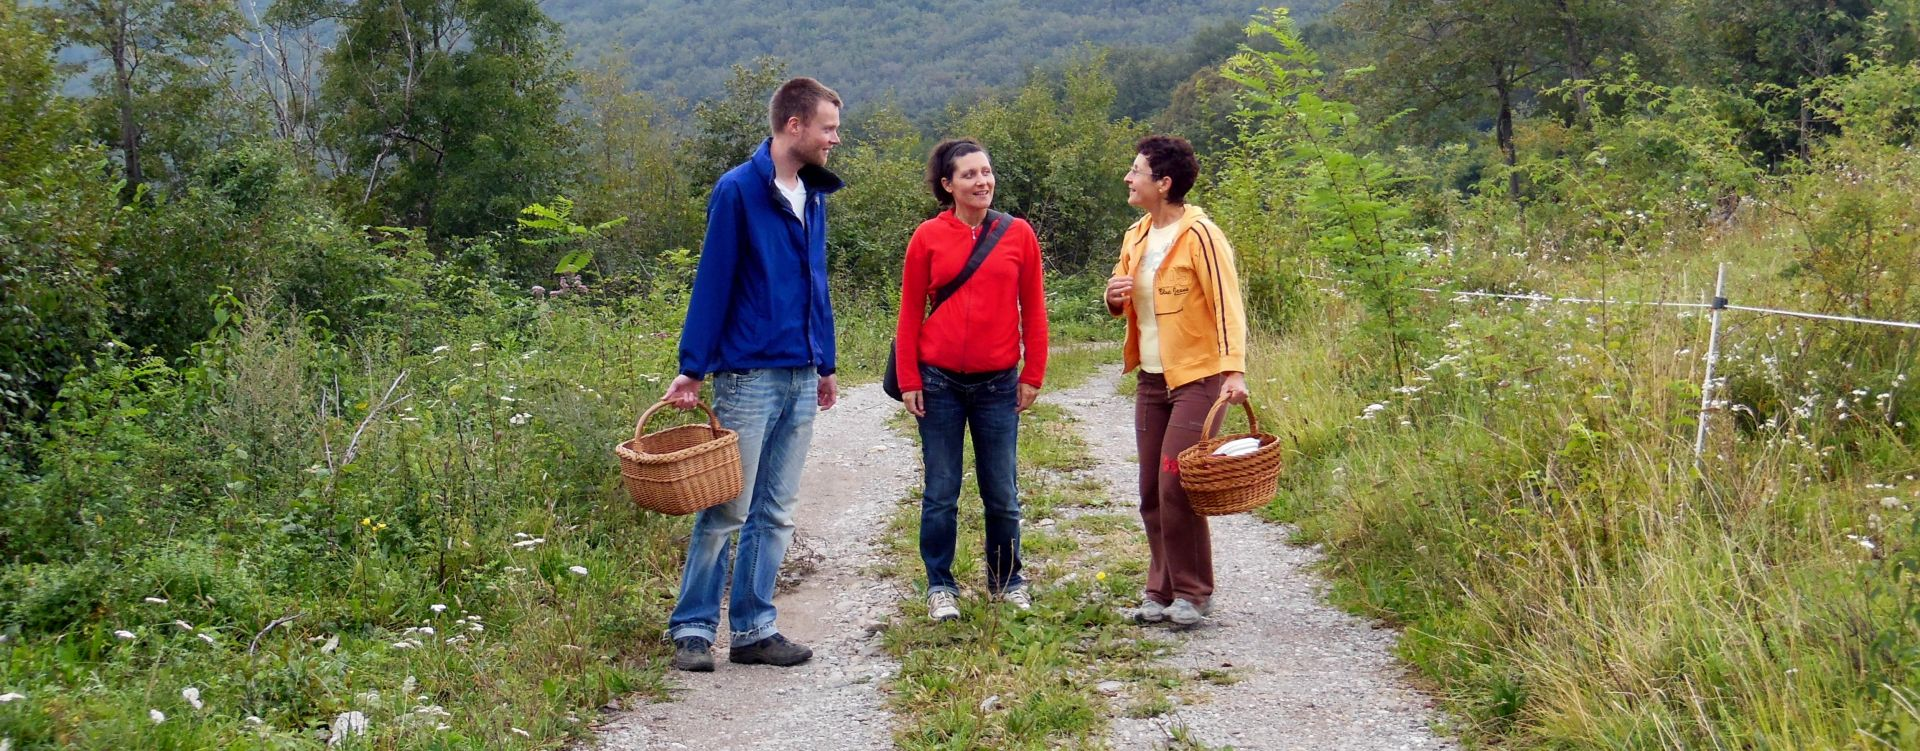 picking herbs soca valley